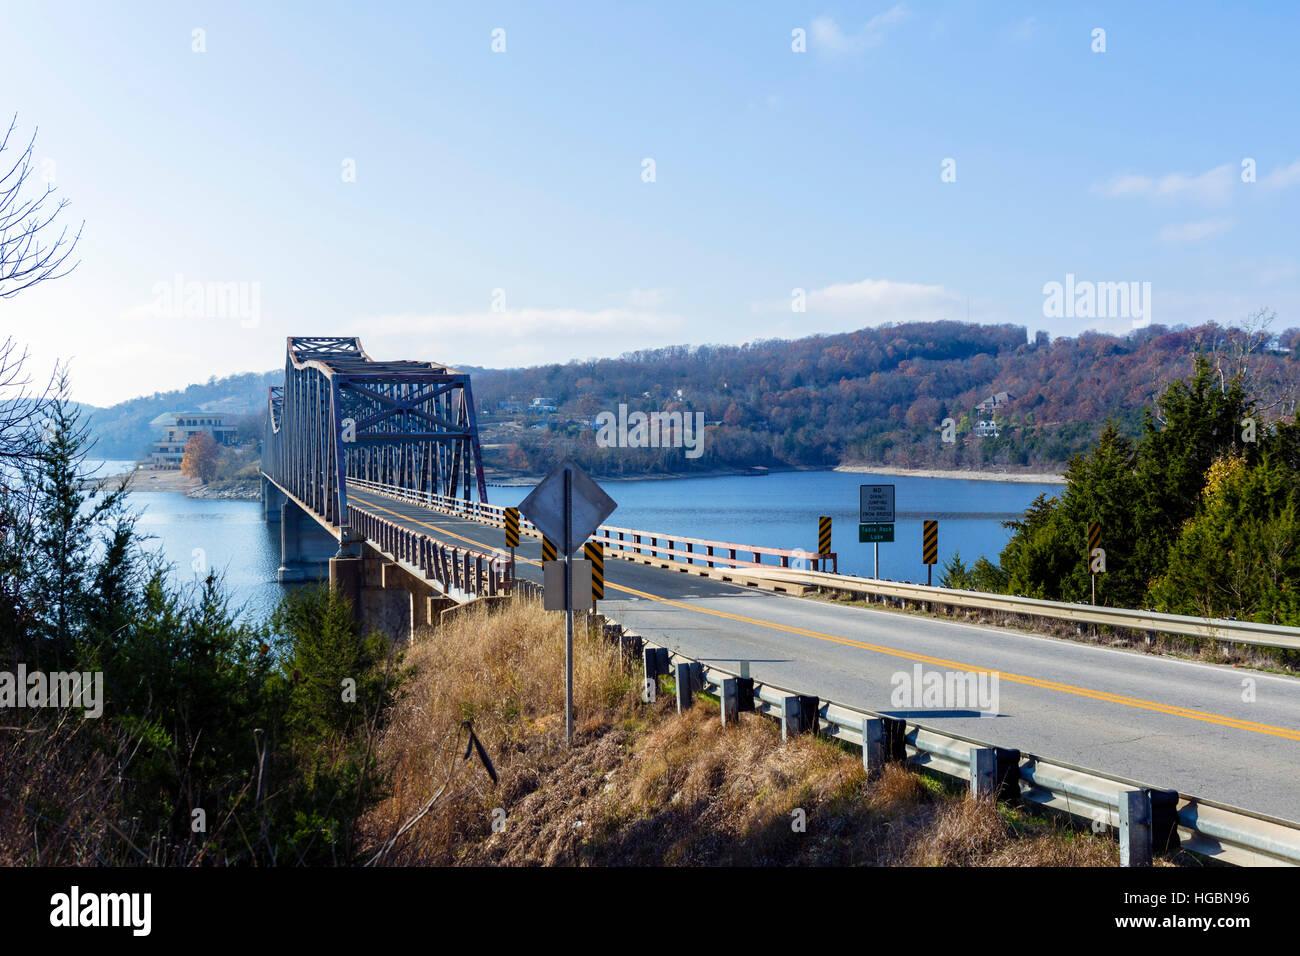 Brücke überqueren auf MO-86 Table Rock Lake, Ridgedale, Ozarks, Missouri, USA Stockbild